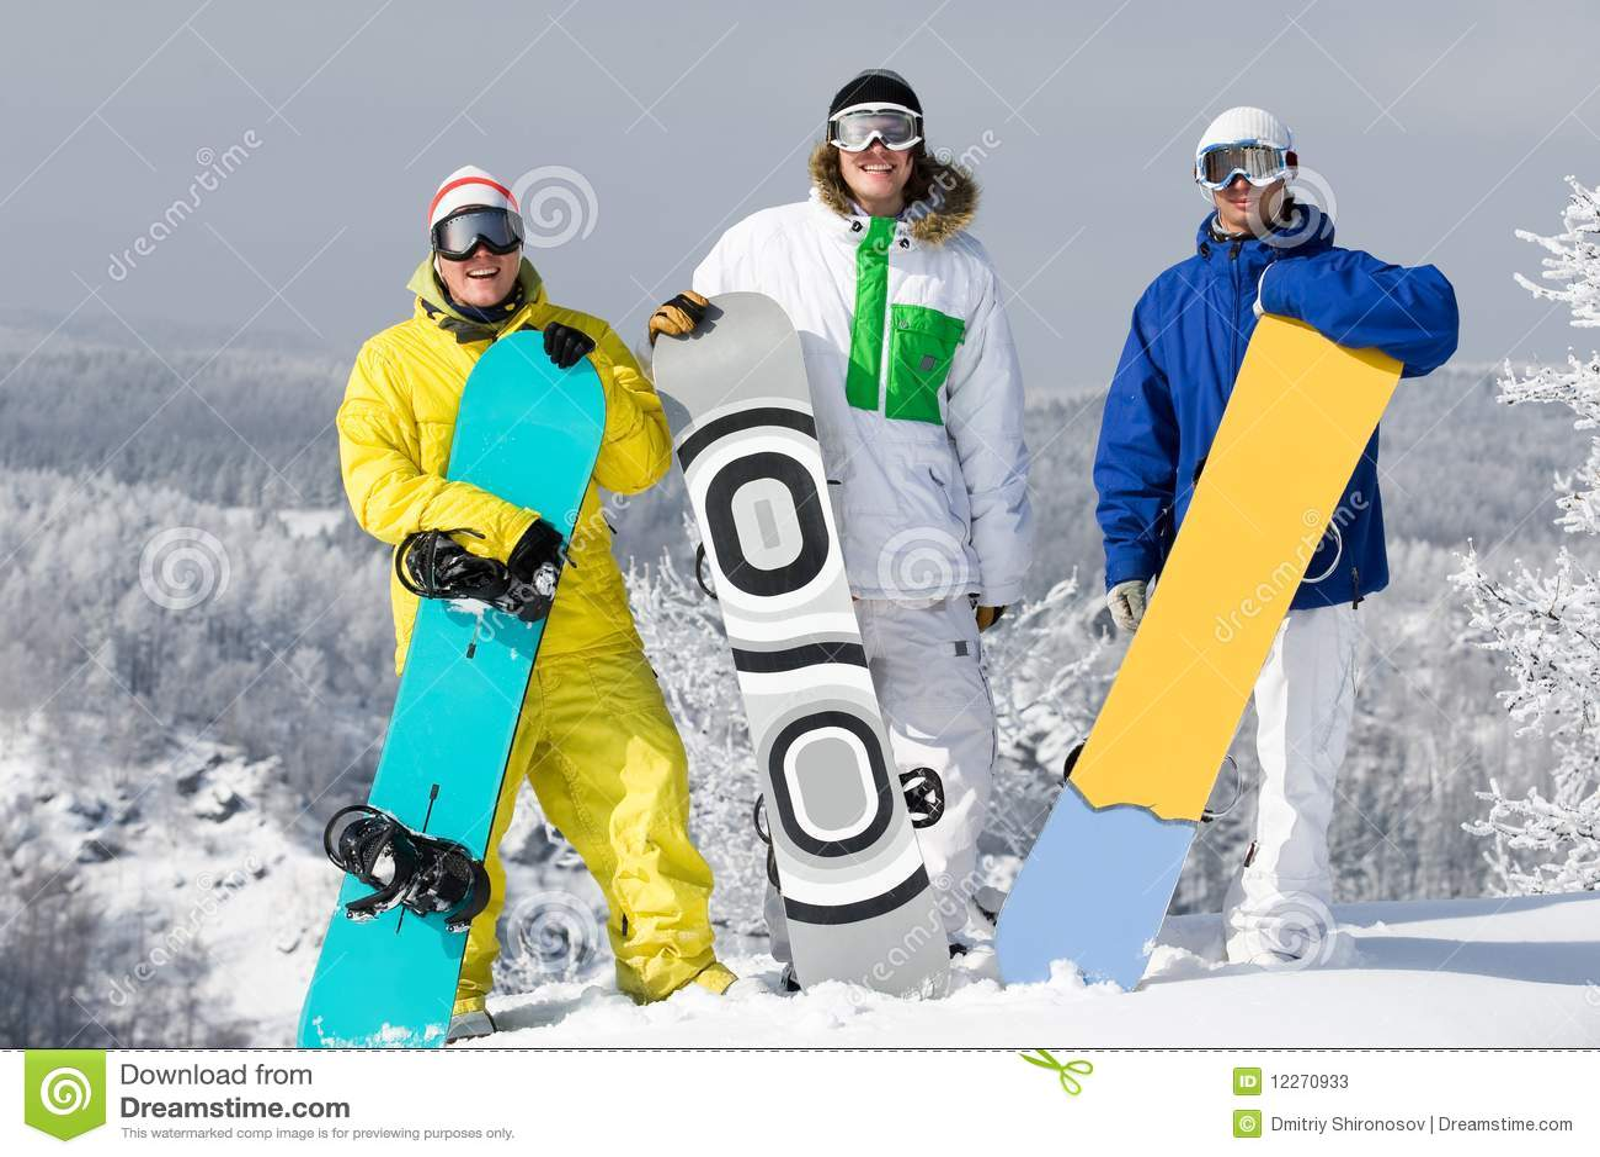 Groupe de snowboarders